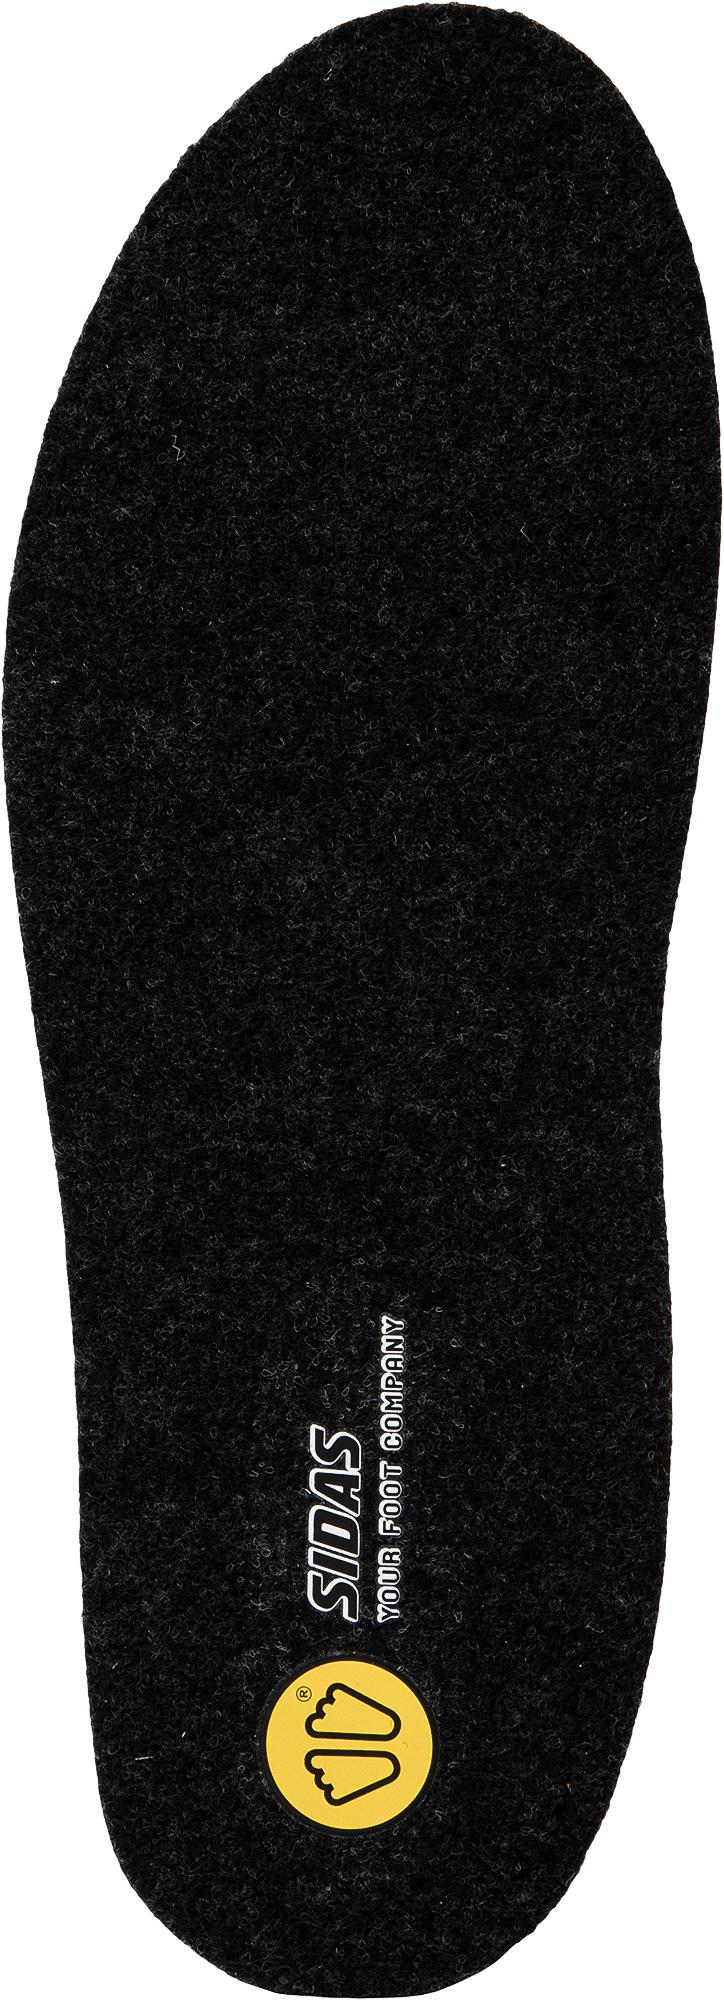 Sidas Стельки Custom Comfort Merino, размер 37-38